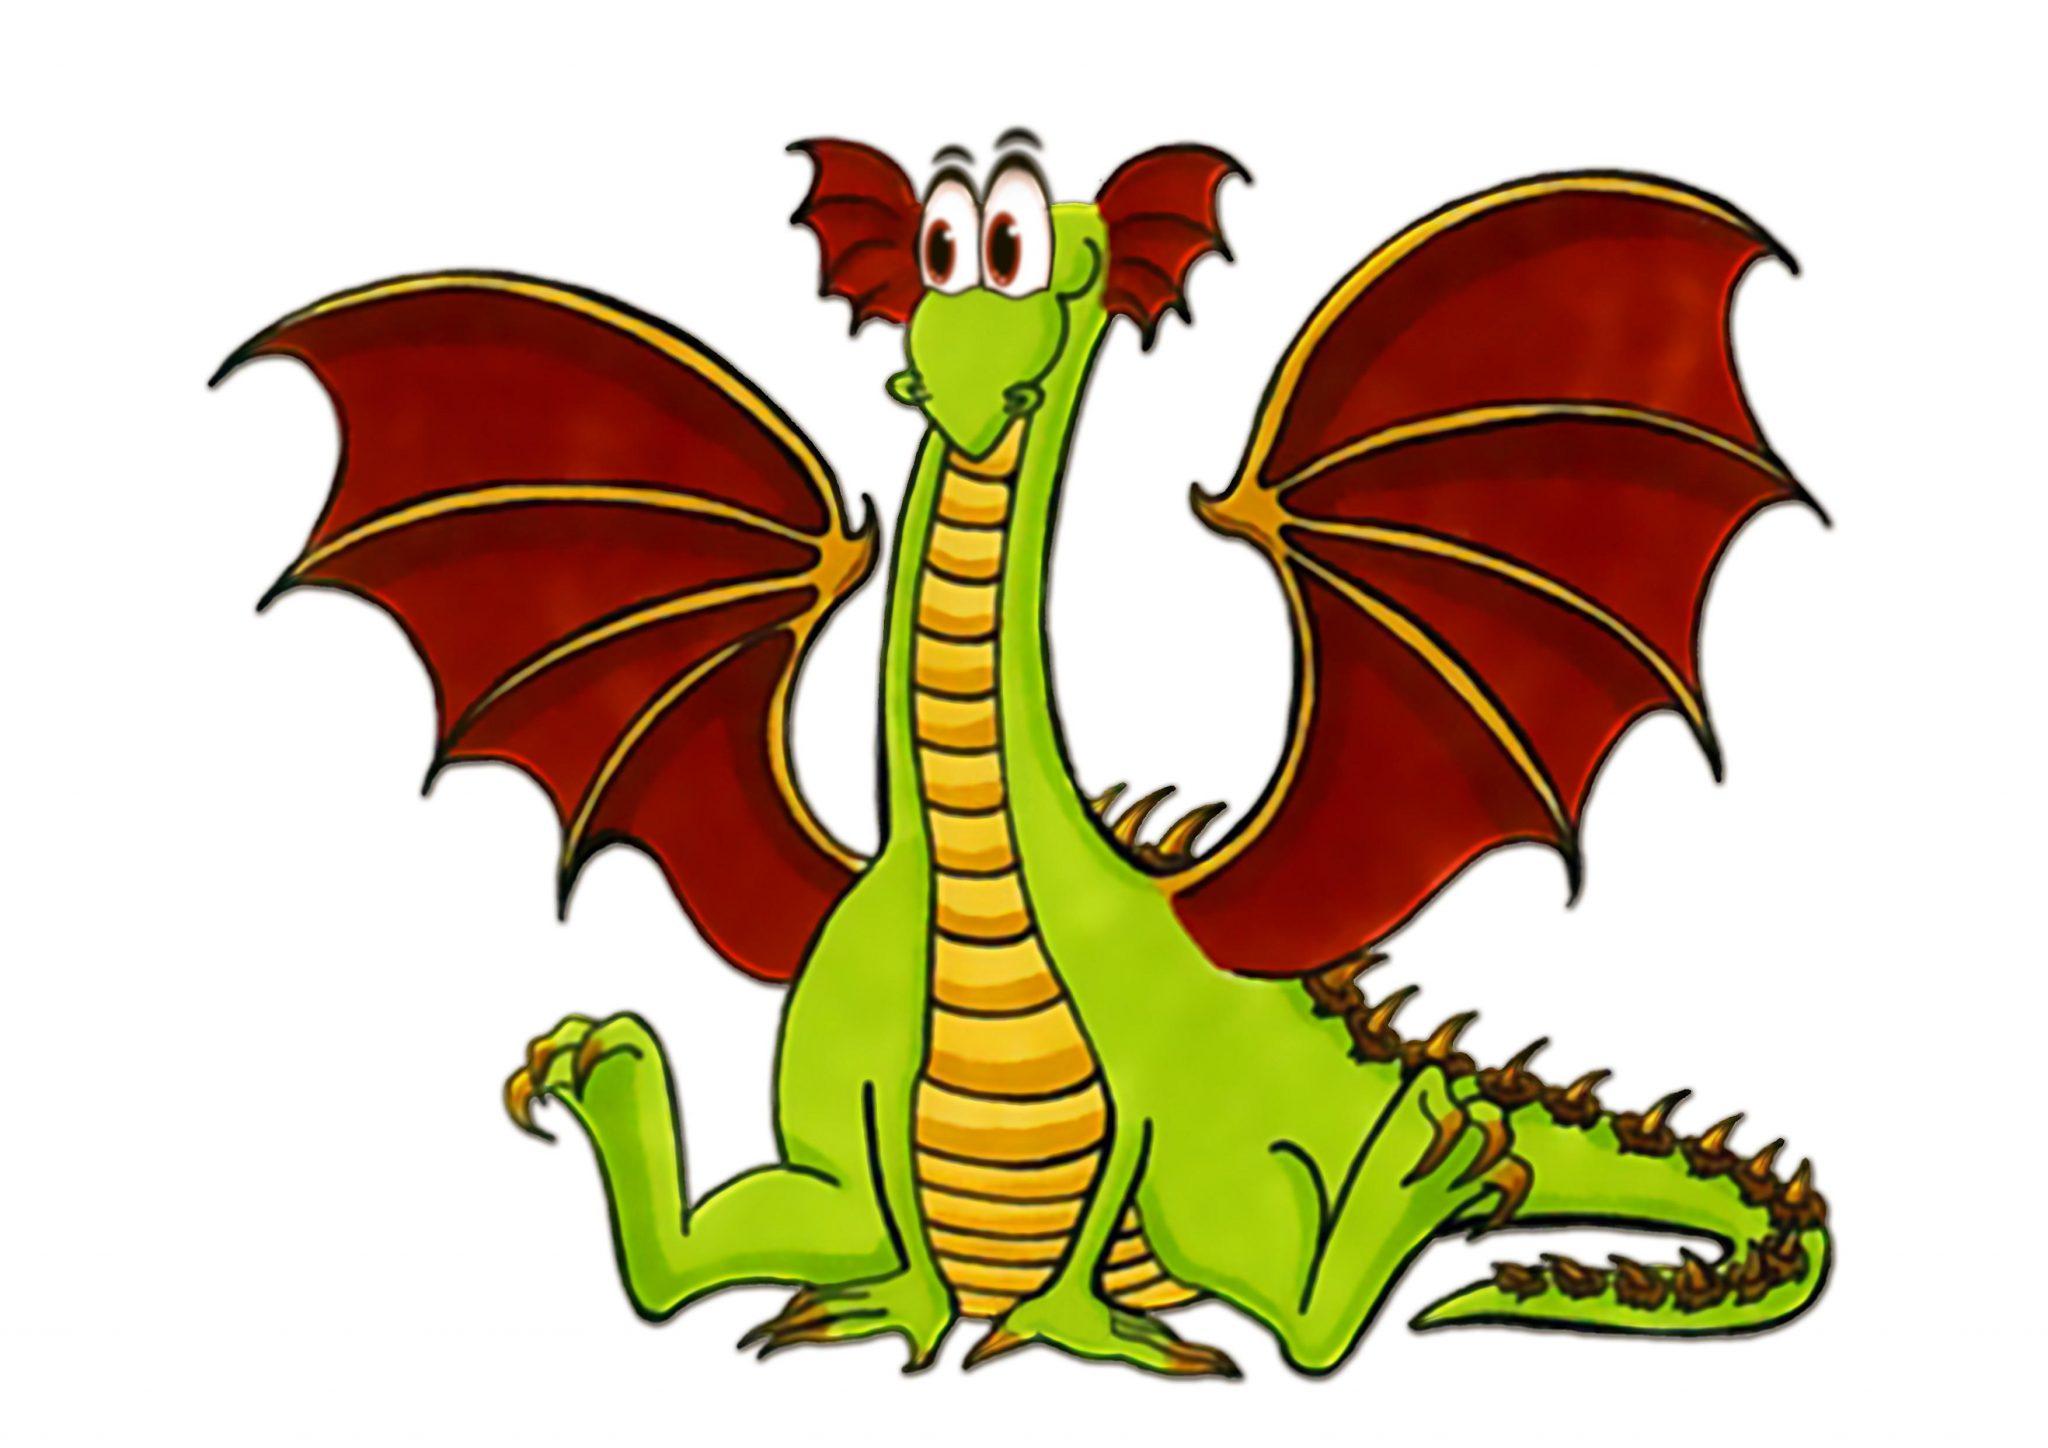 Рисунок доброго дракон